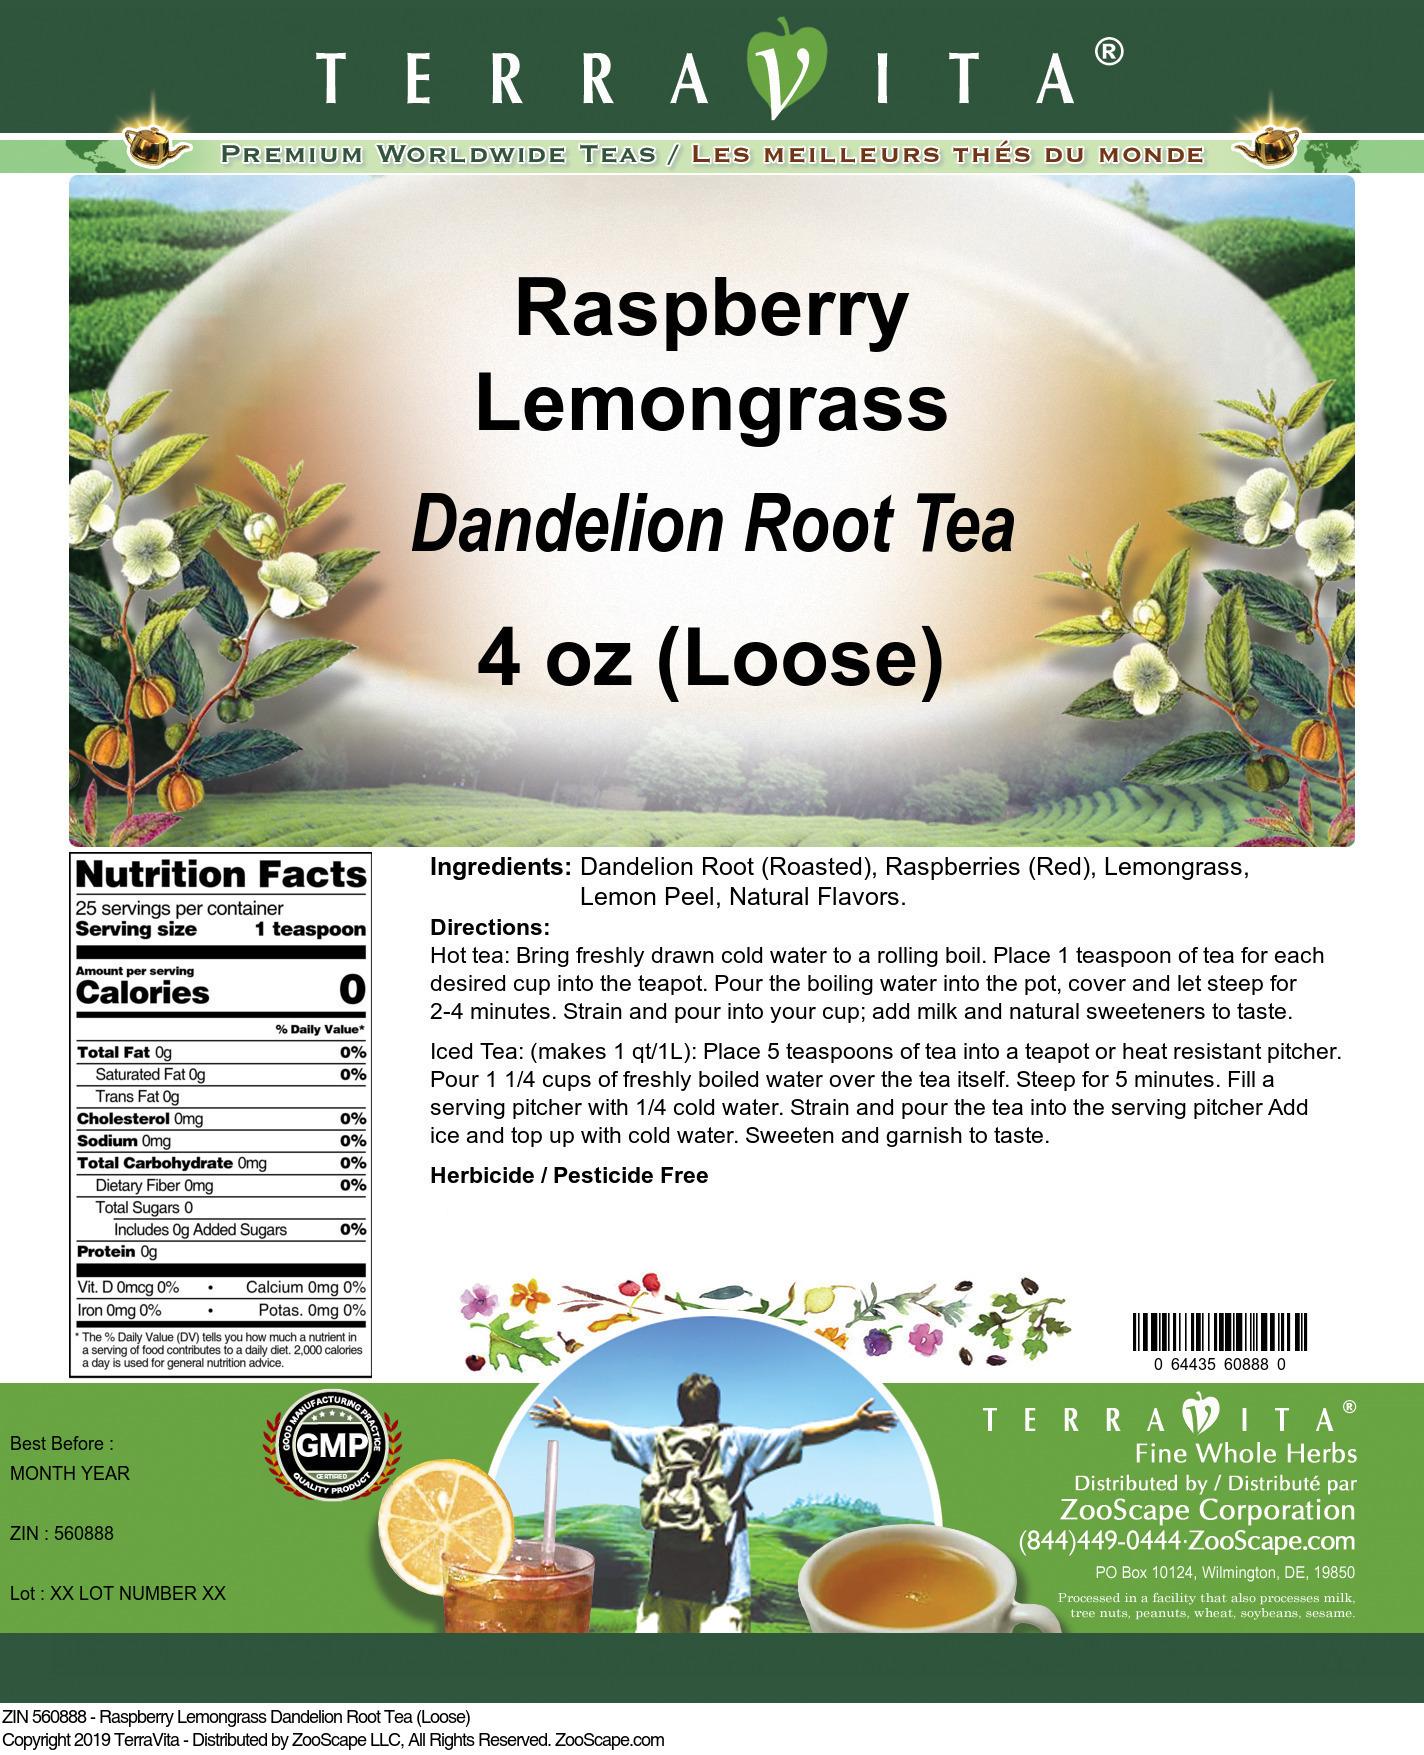 Raspberry Lemongrass Dandelion Root Tea (Loose)